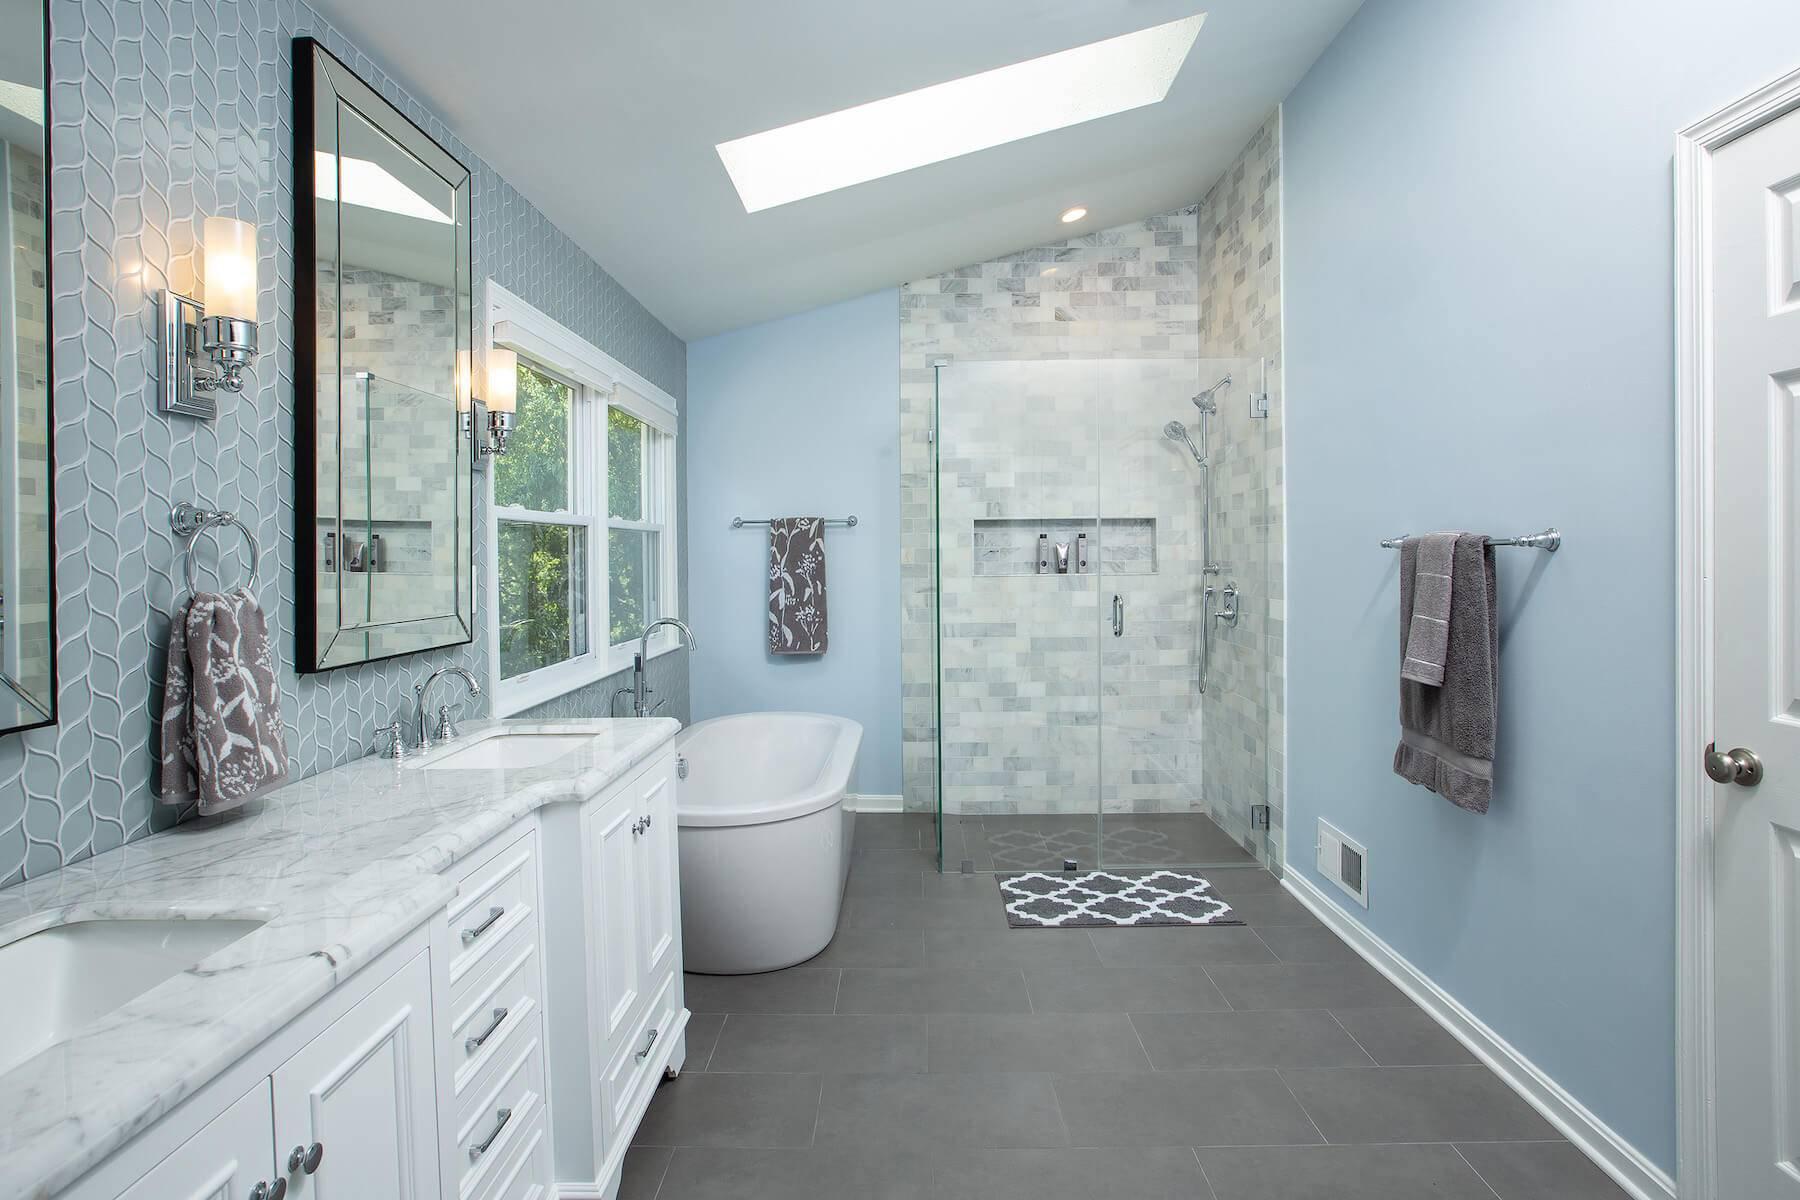 Bathroom_MBa_5-24-19_364